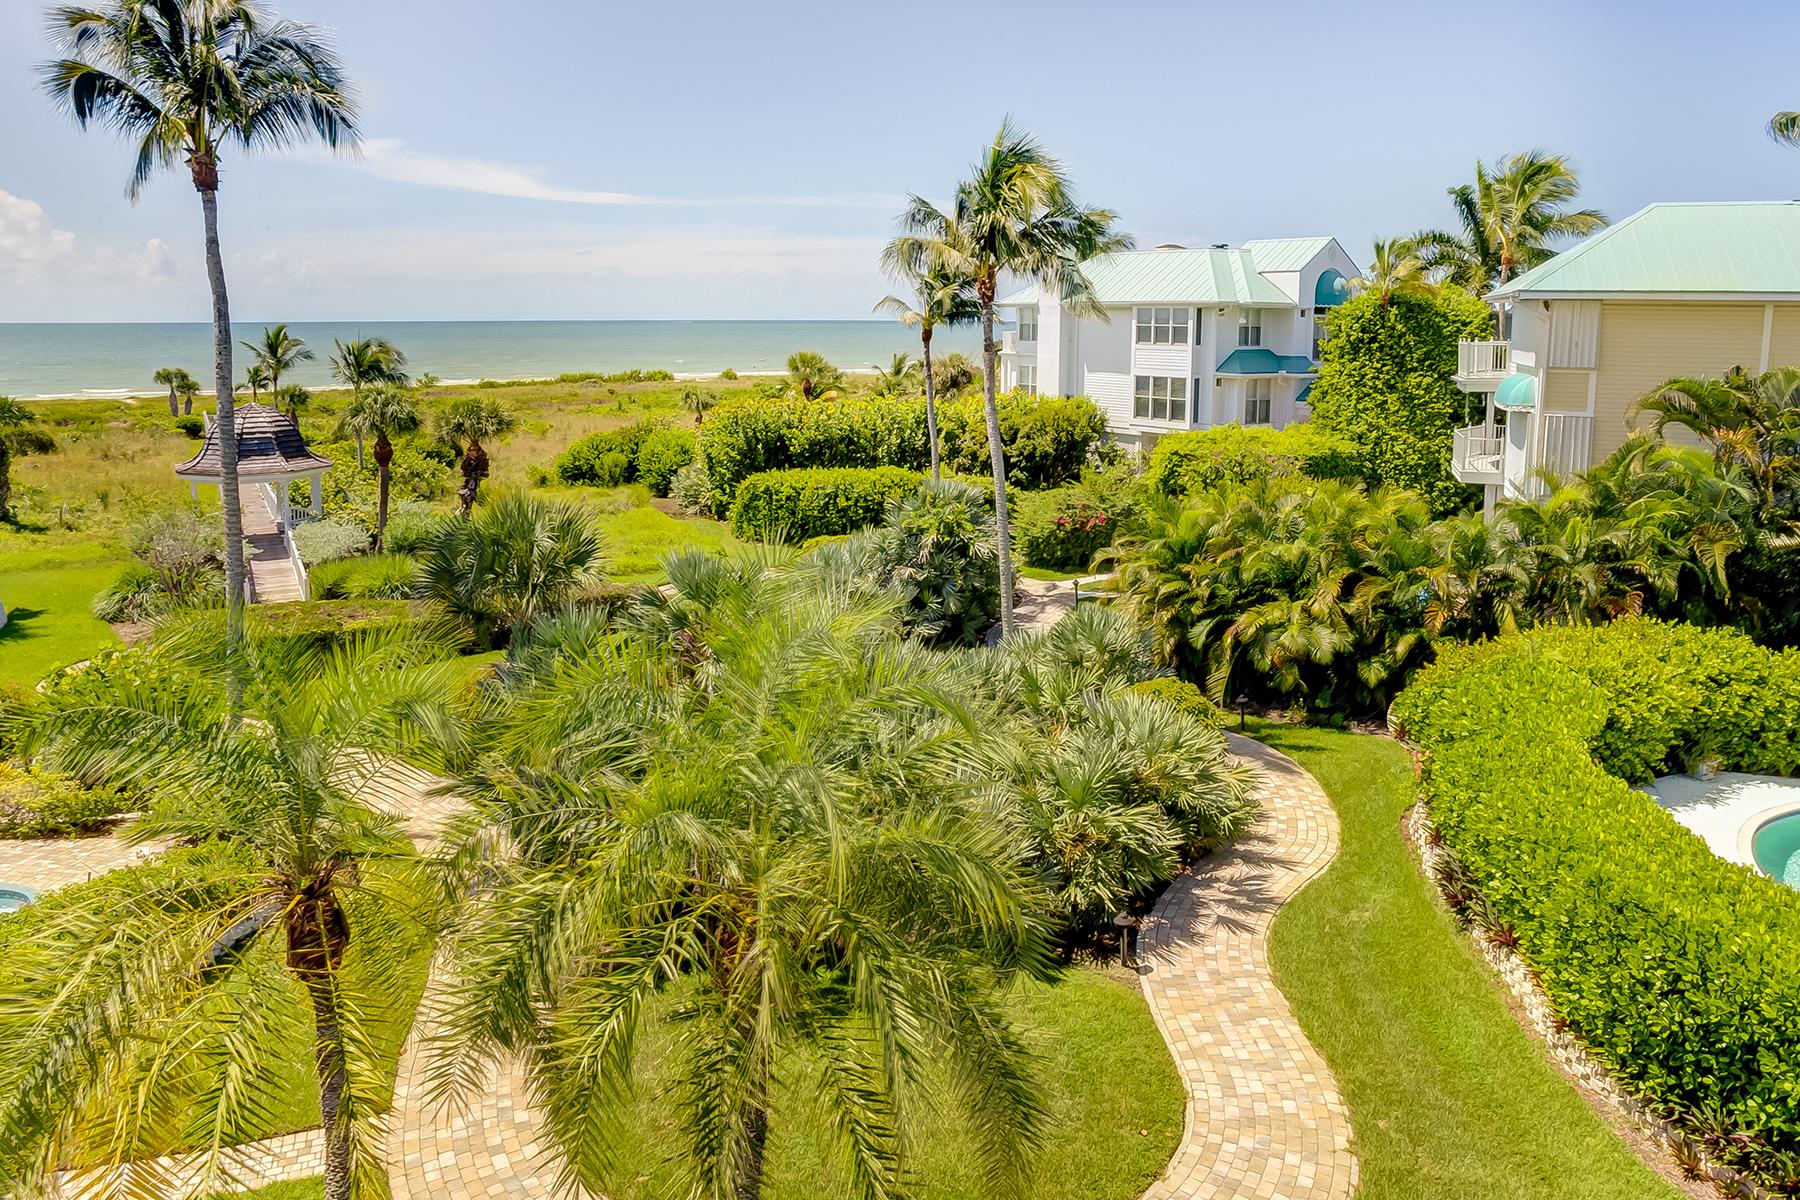 Single Family Home for Sale at SANIBEL 411 Bella Vista Way E, Sanibel, Florida 33957 United States